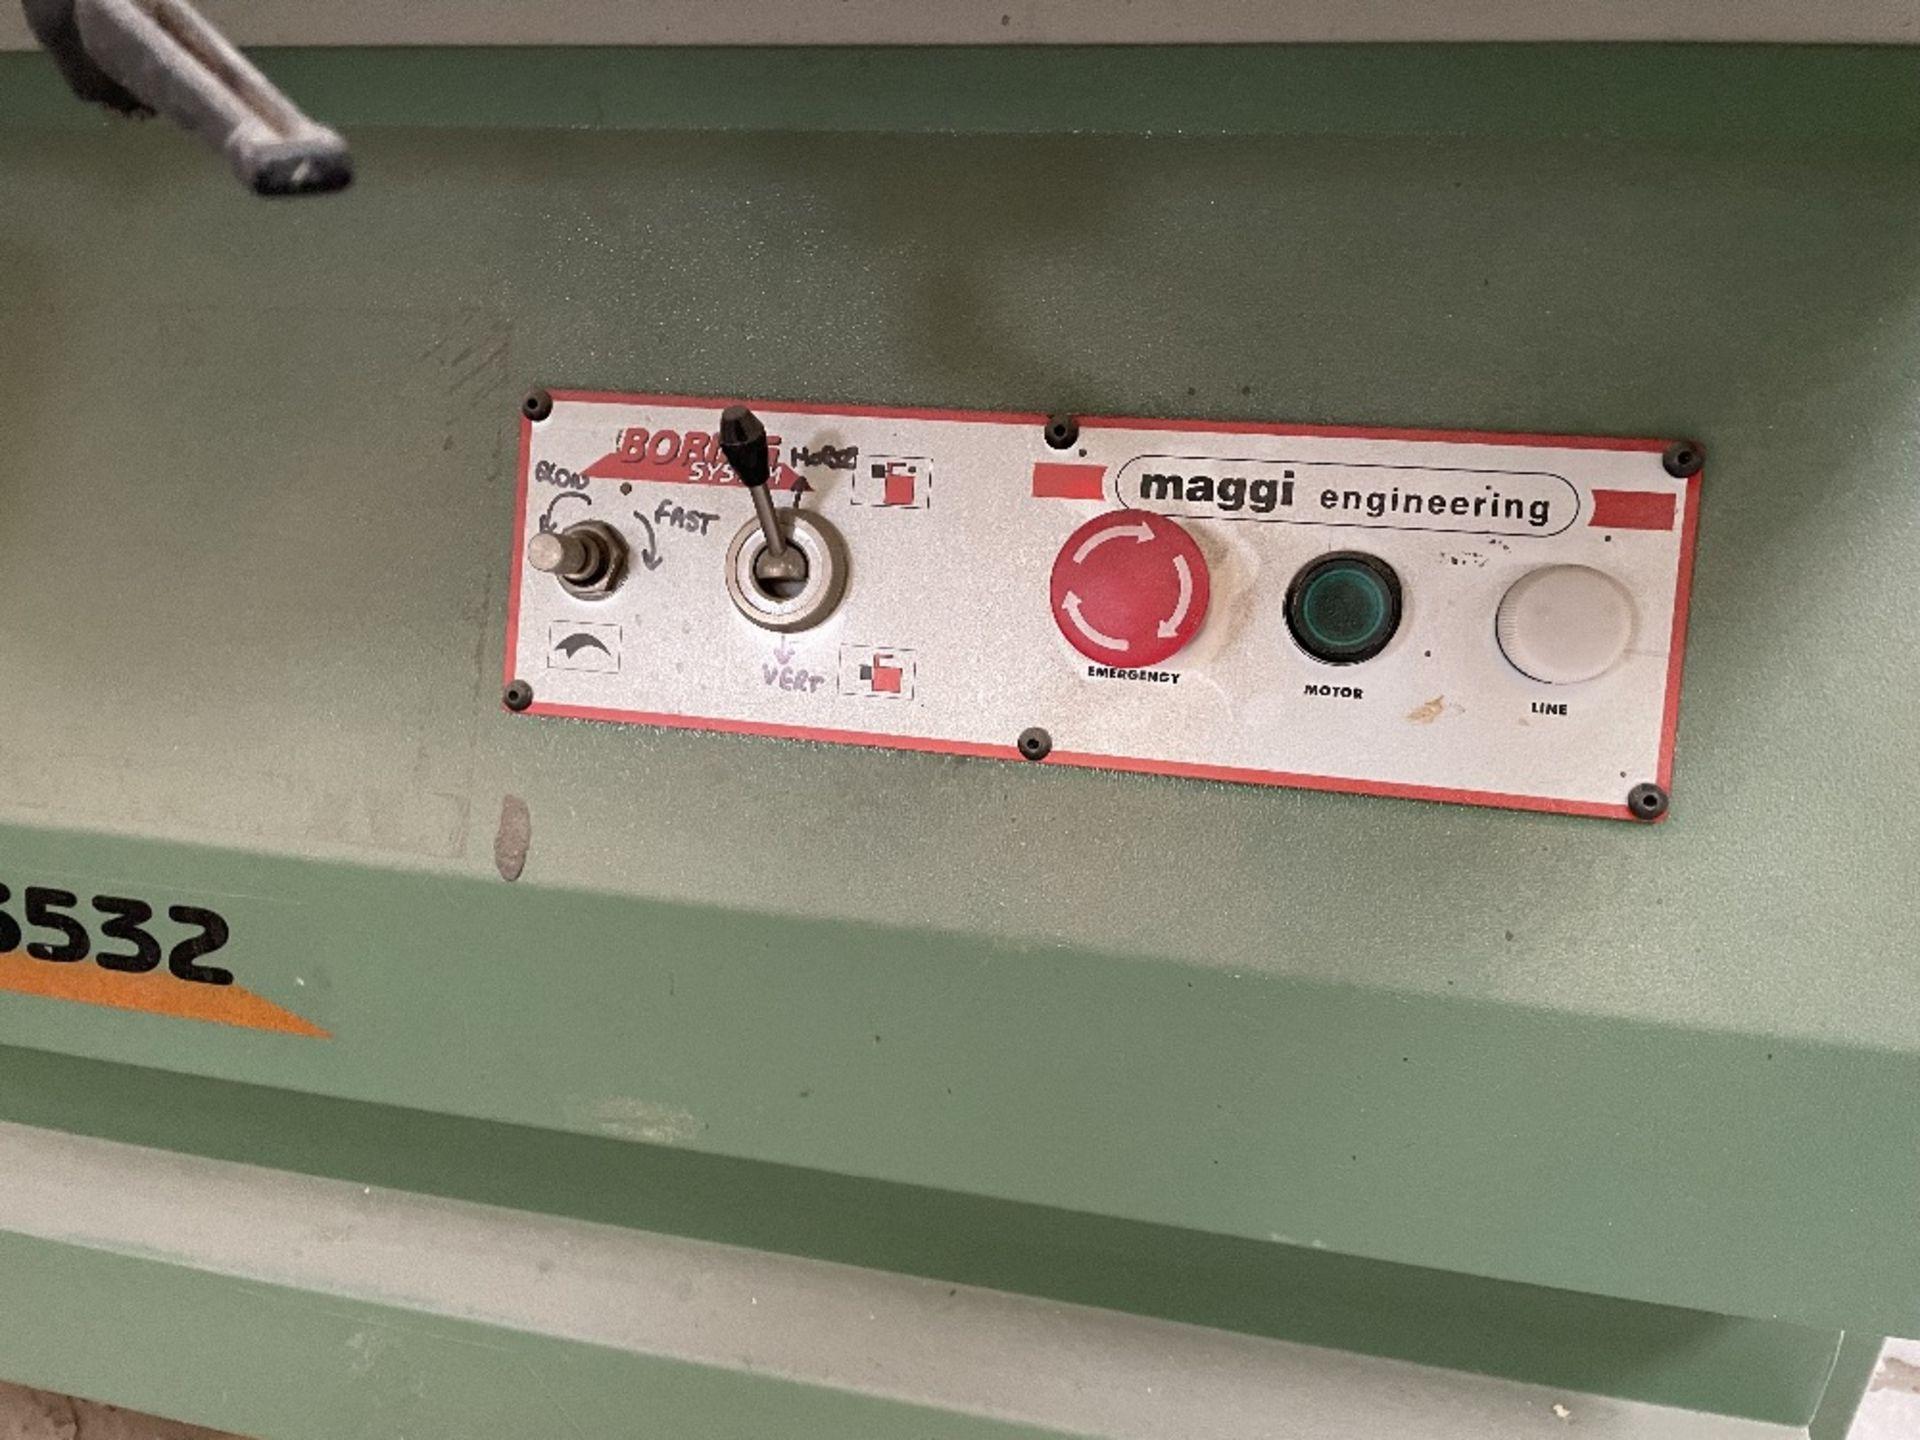 Maggi 3532 4 Head Boring Machine w/ Tool Cabinet & Tooling | YOM: 1999 - Image 4 of 12